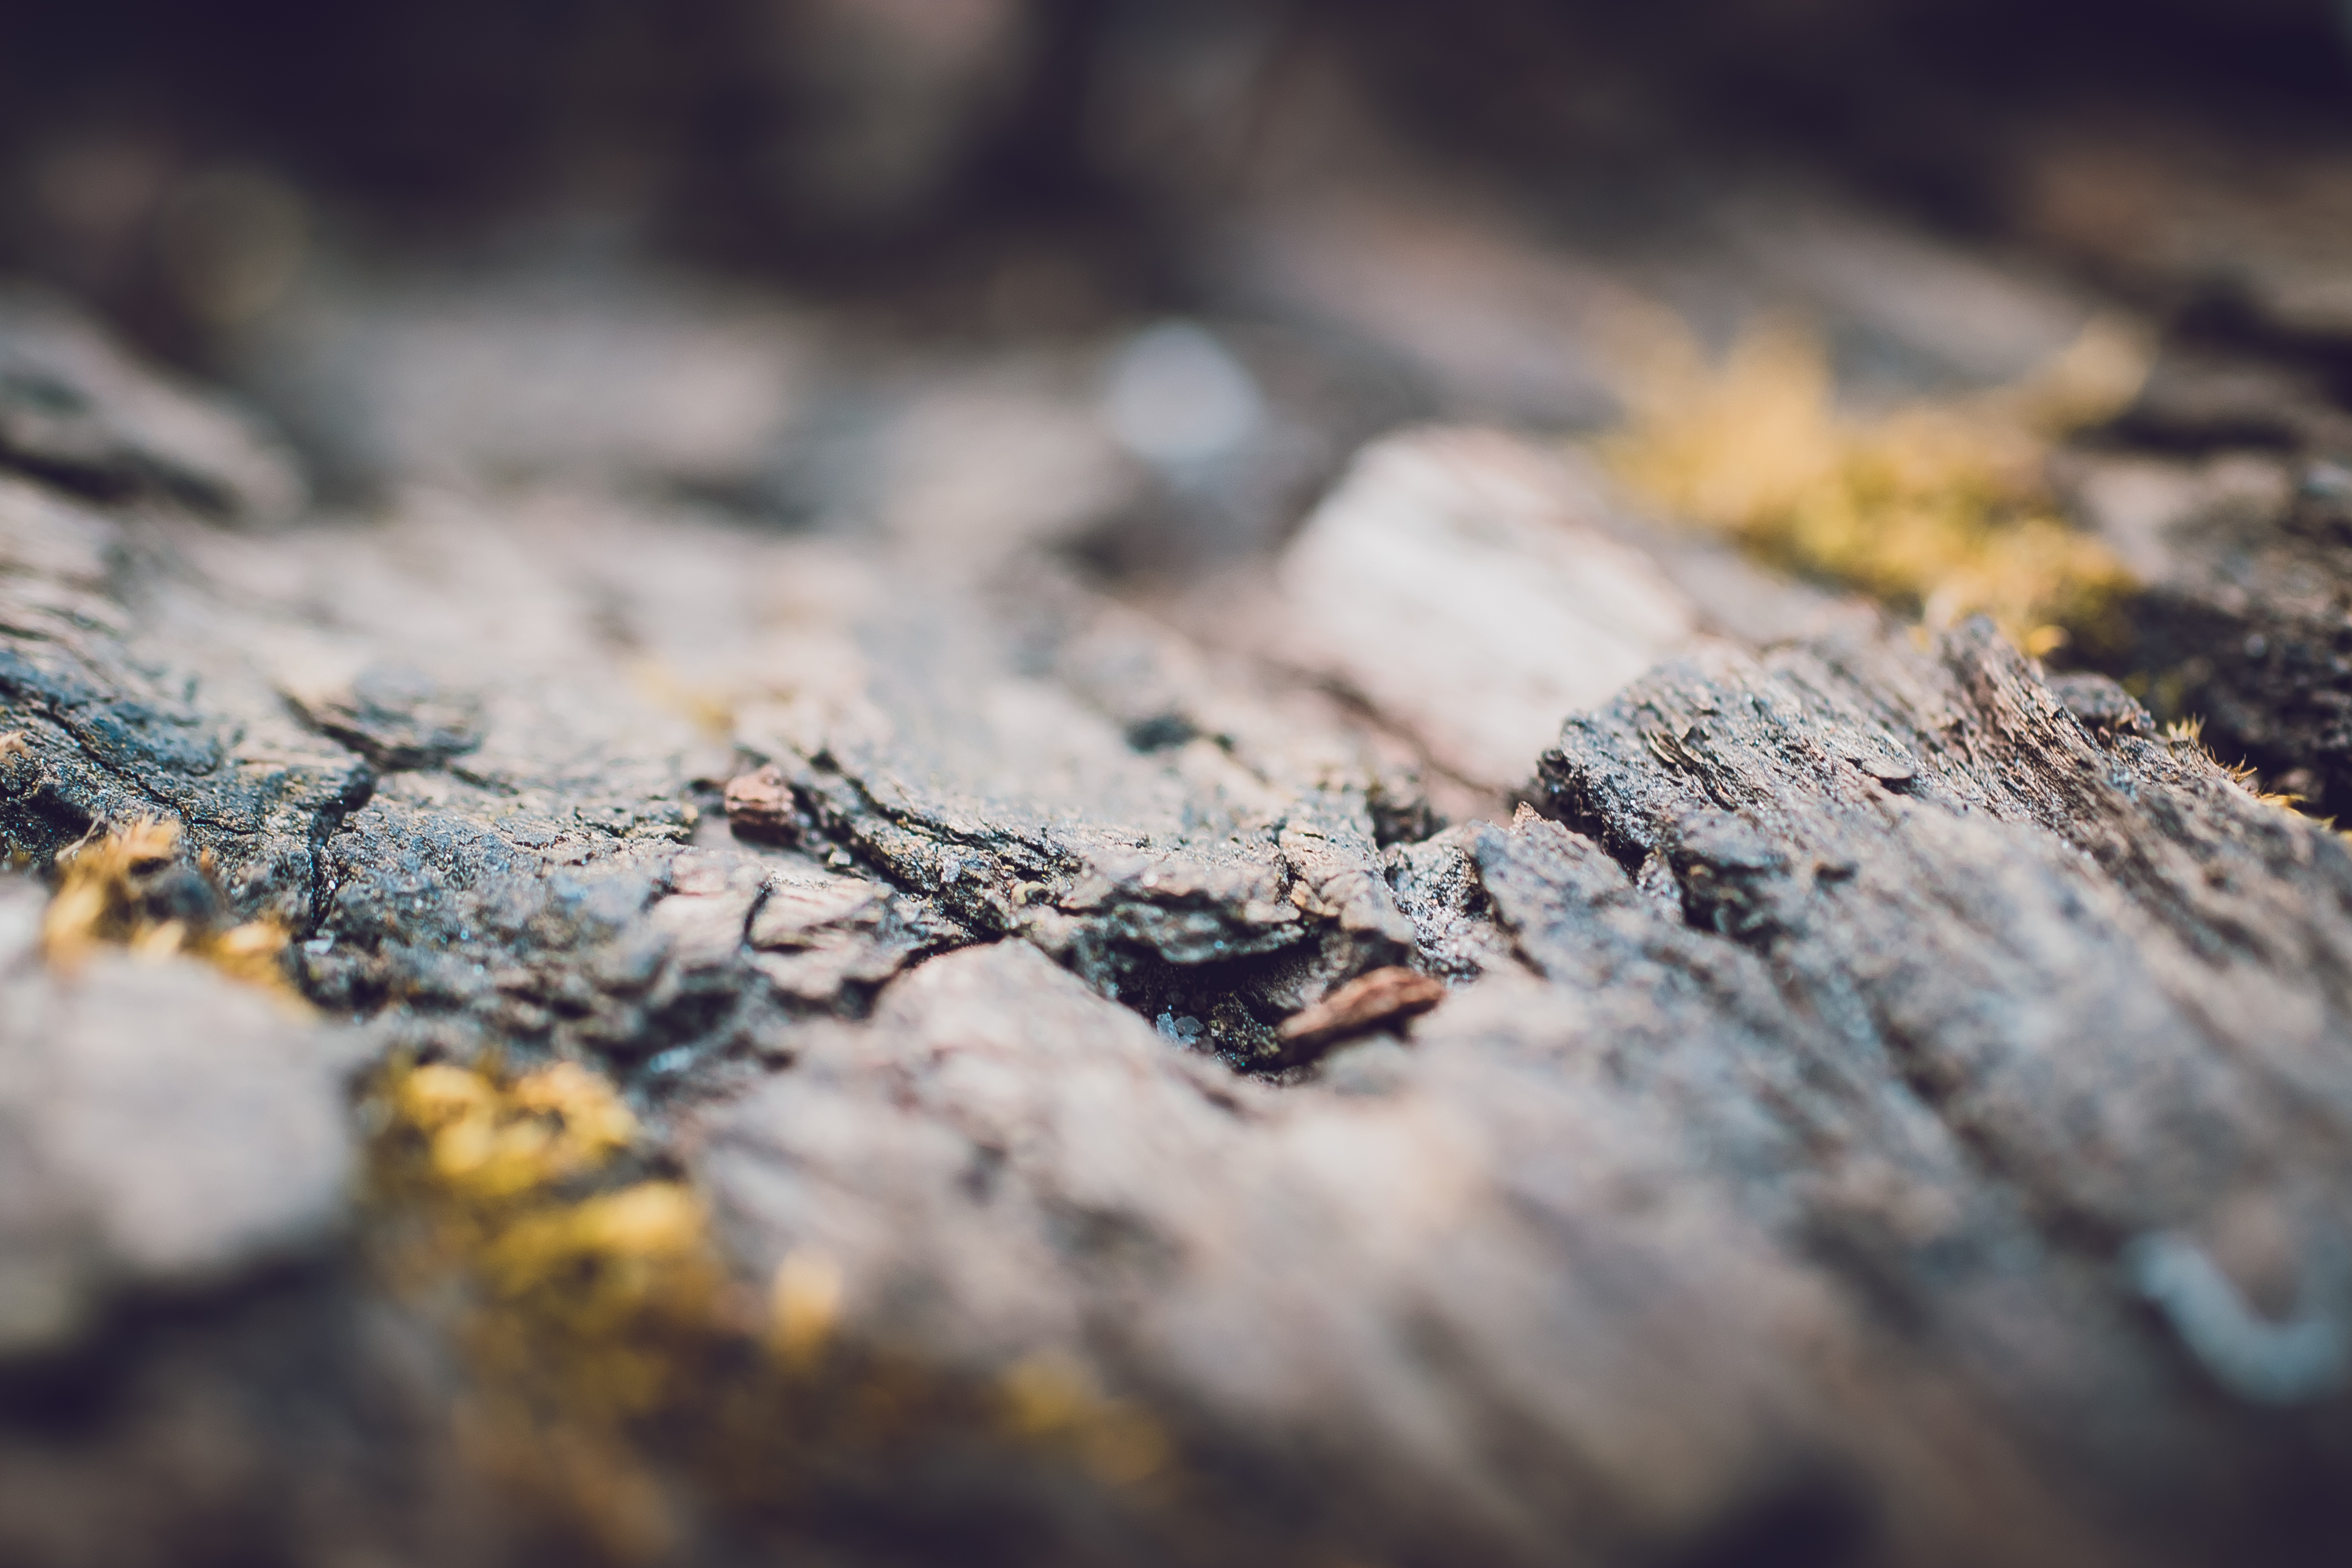 Fault, trunk, branch, bark, wood, moss, focus, tree